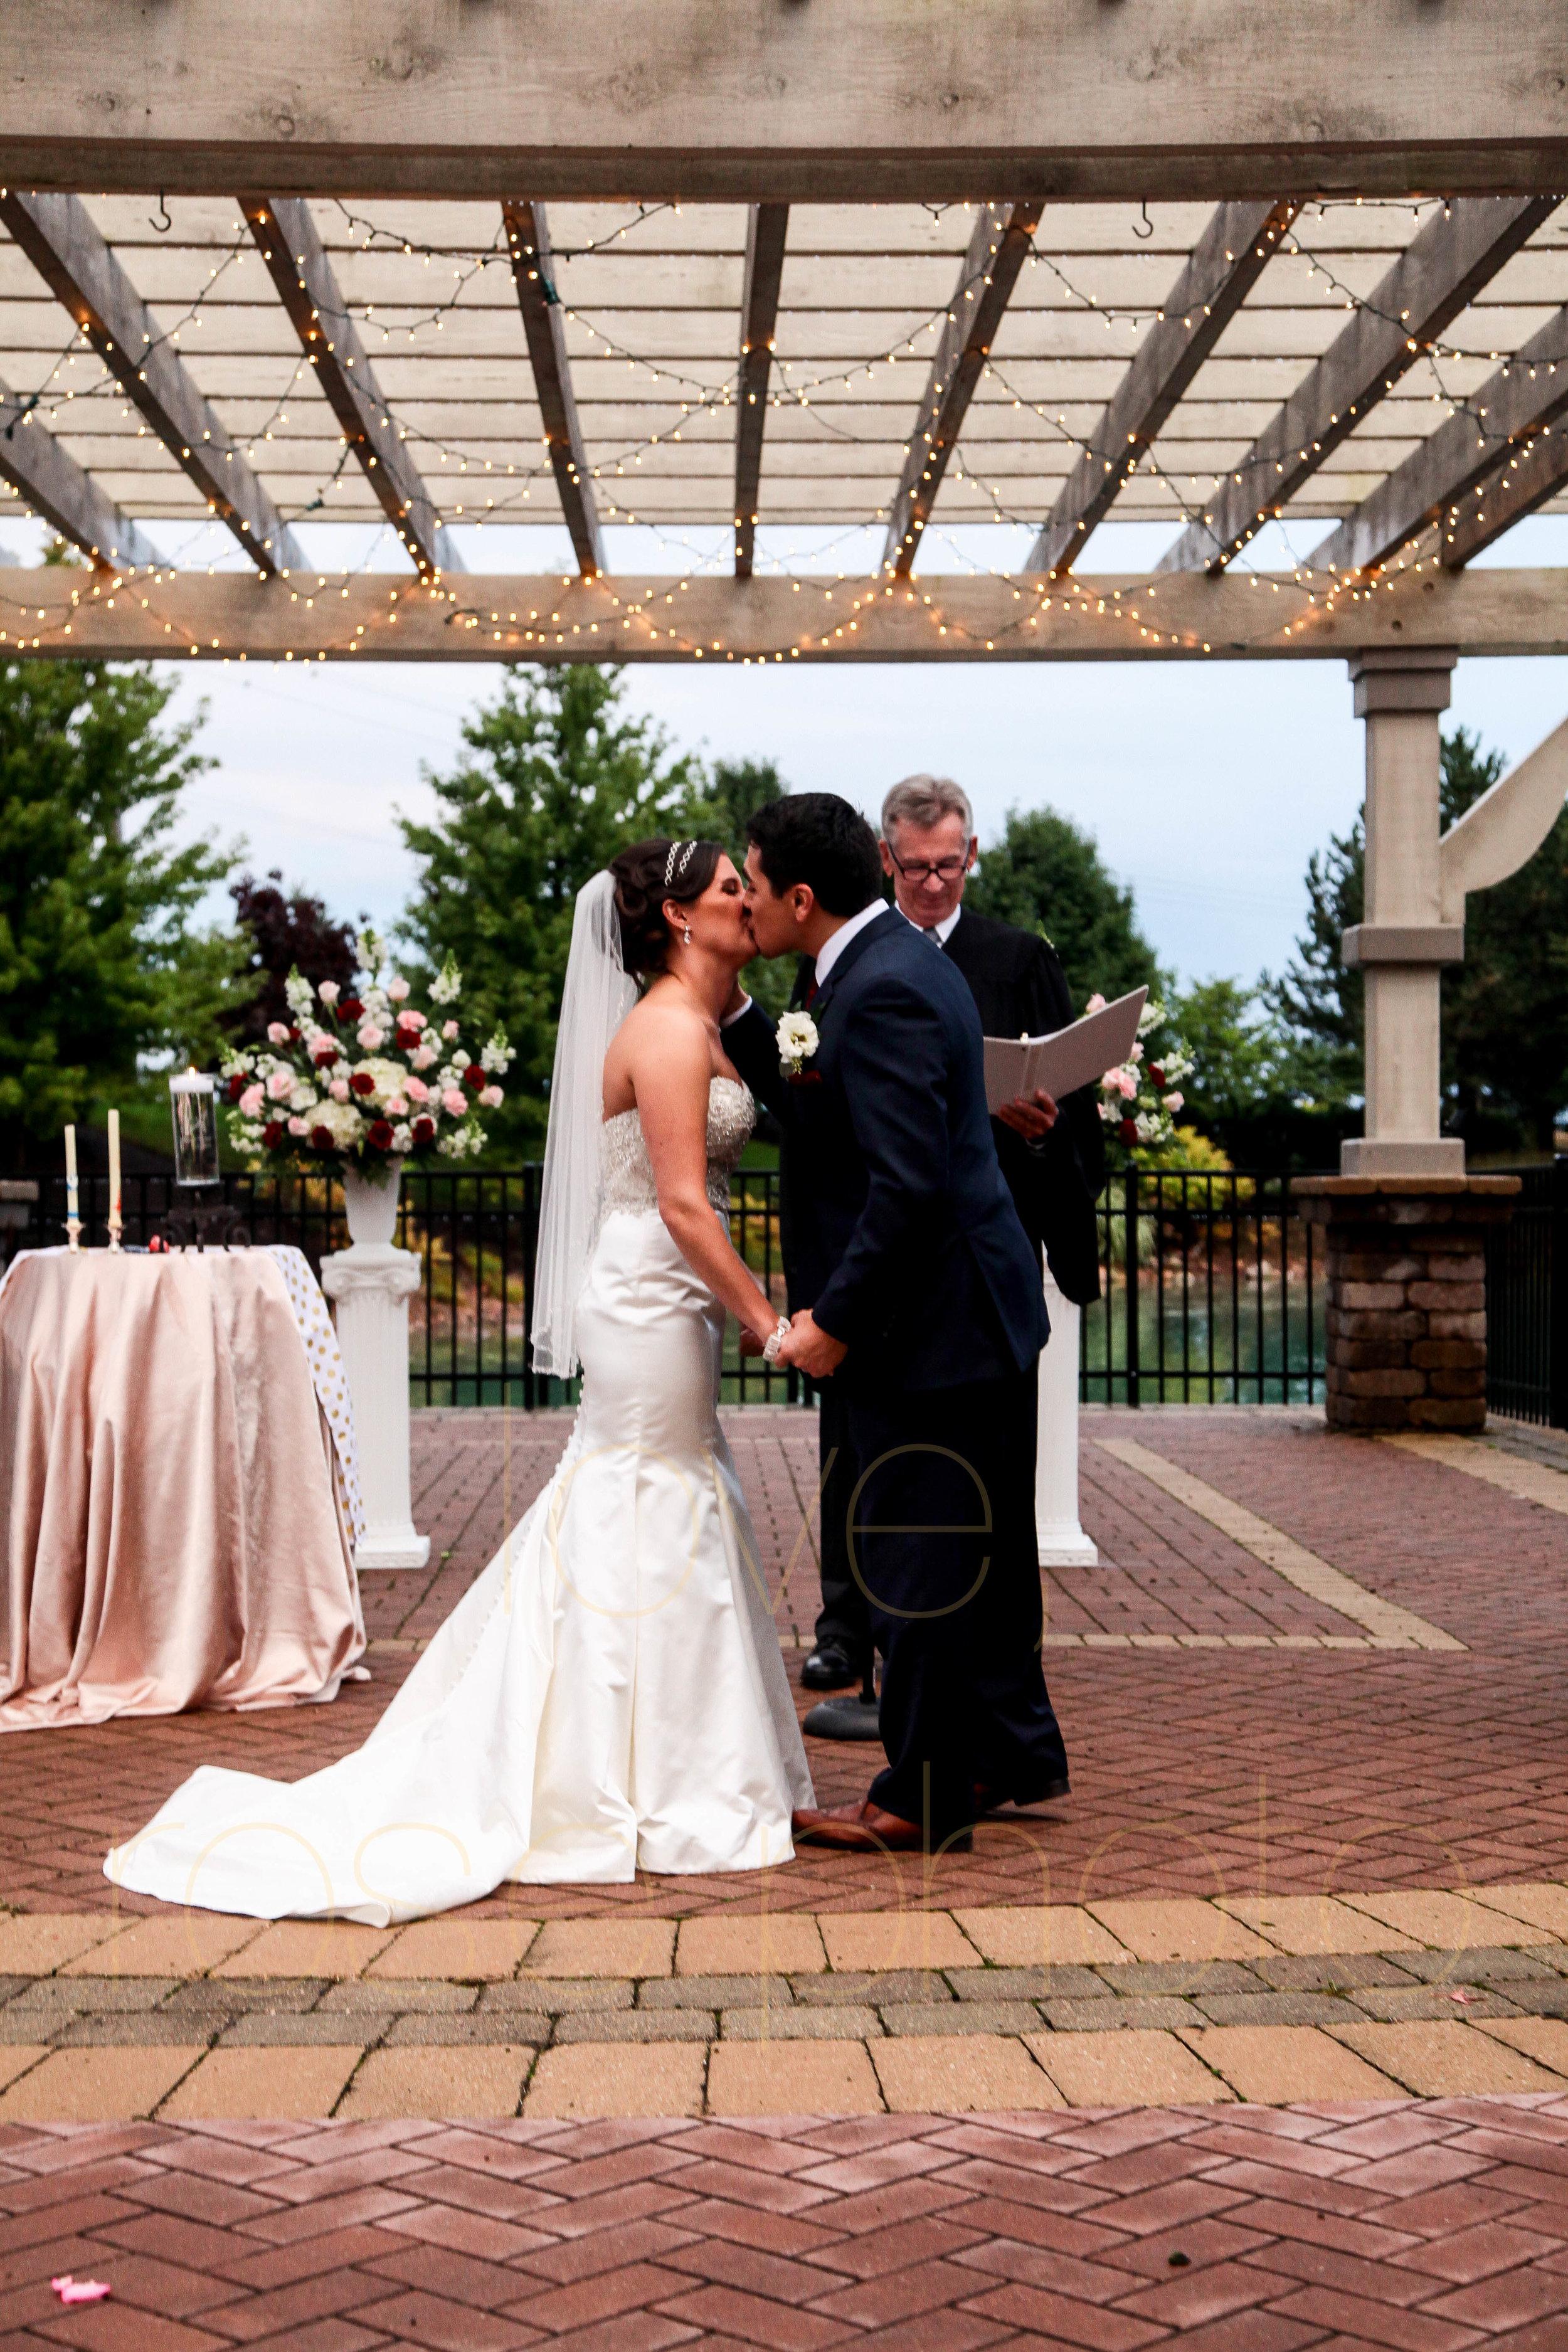 Alison + Mike Chicago Wedding Photographer Blog -36.jpg